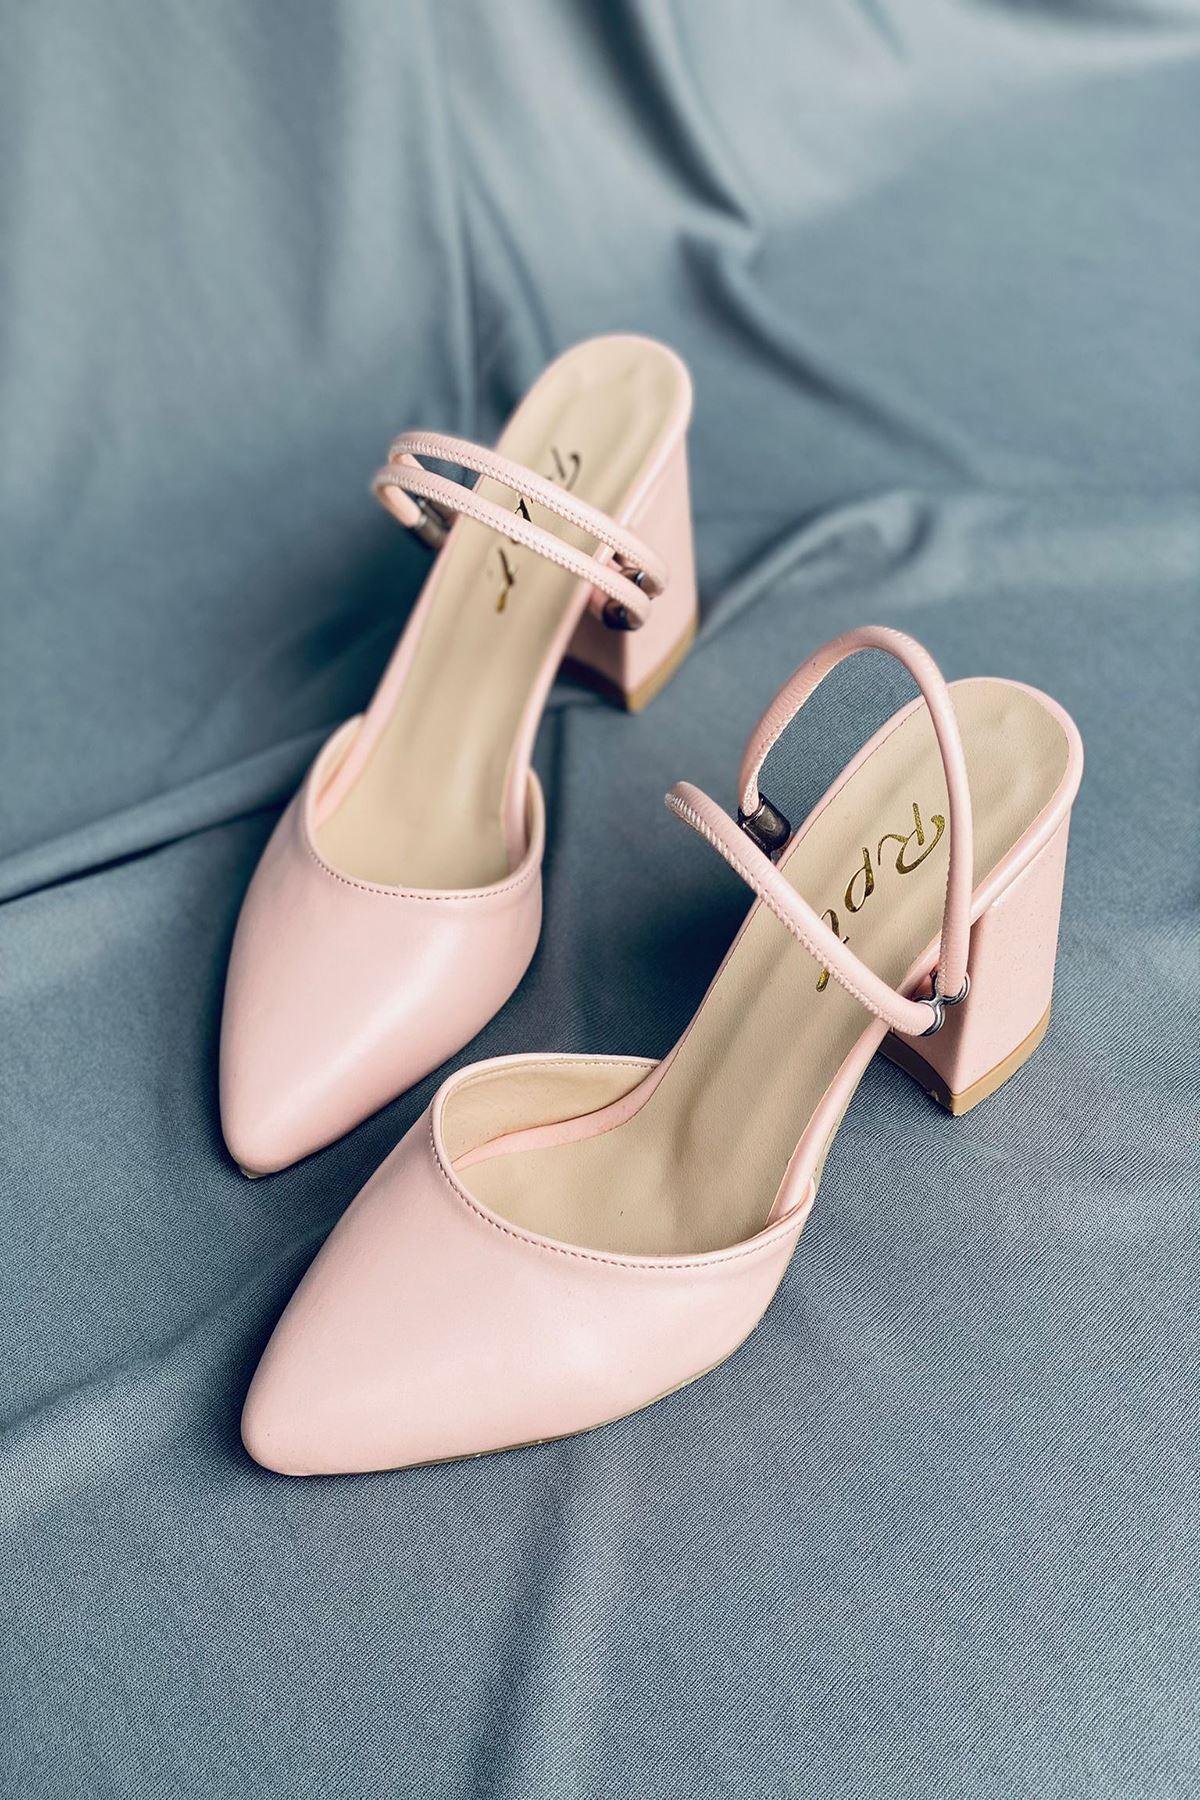 Y119 Pudra Deri Topuklu Ayakkabı